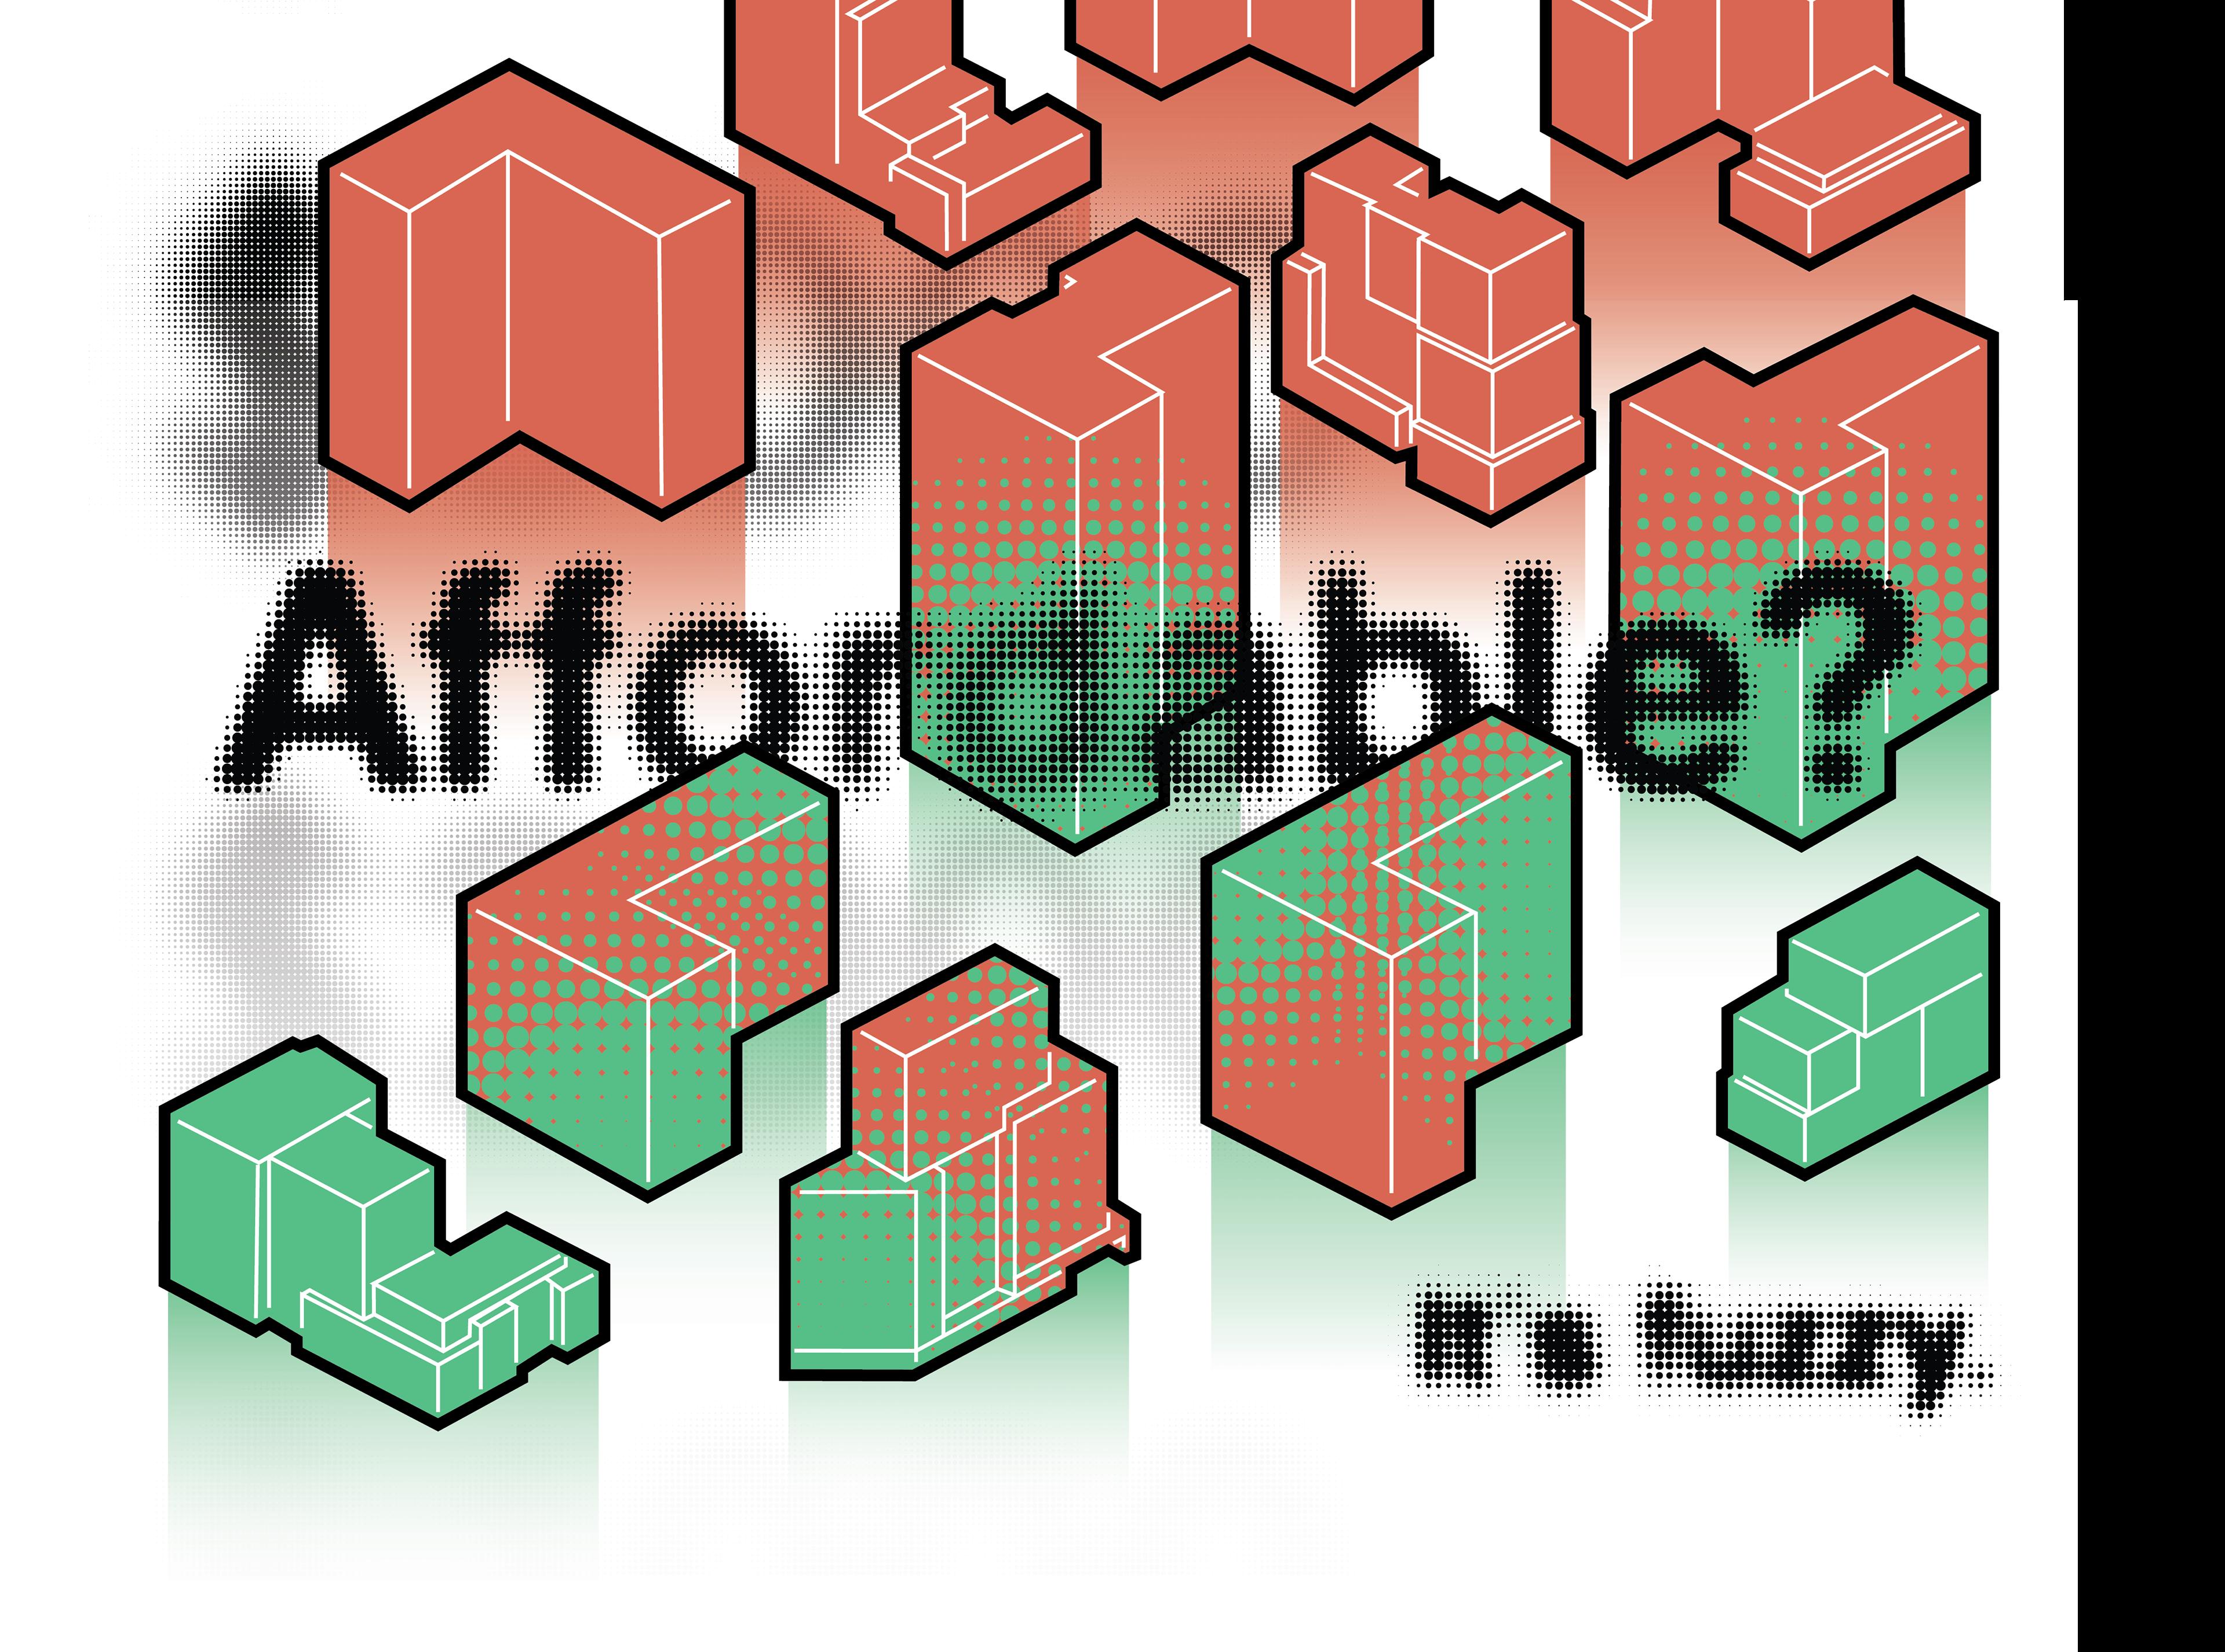 Neighborhood clipart isometric. Design bk affordable it